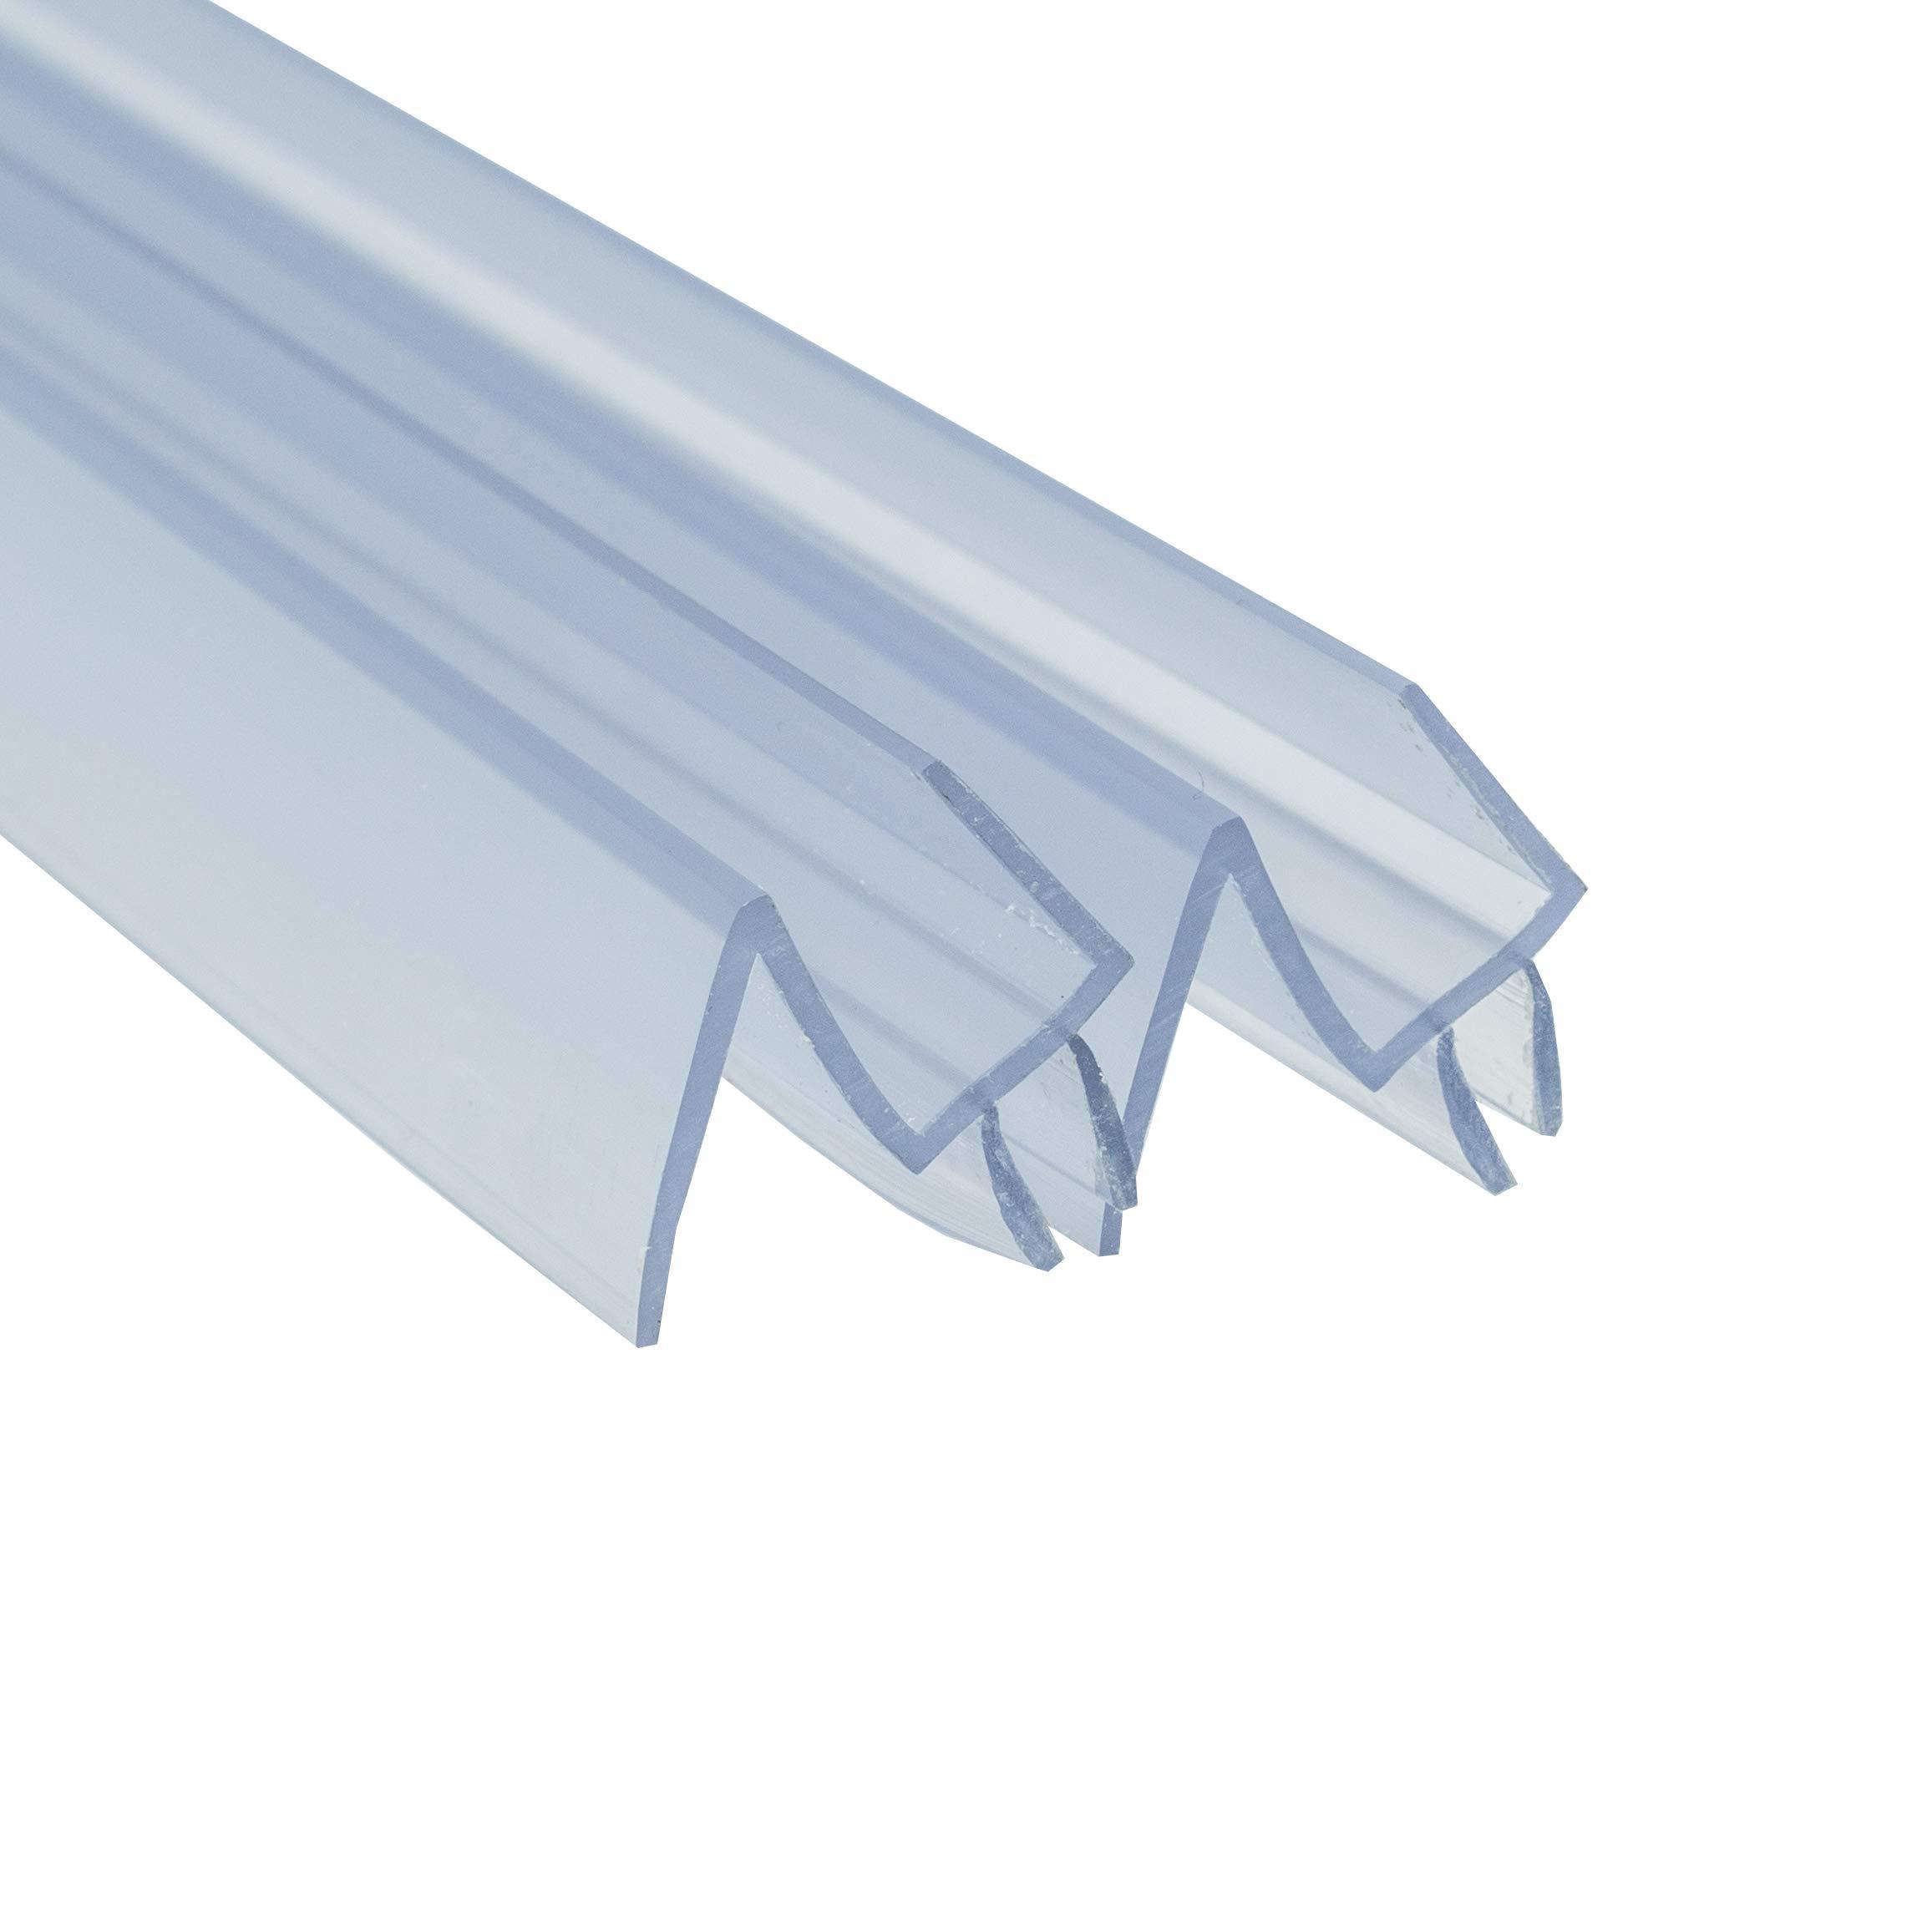 Frameless Shower Door Bottom Seal Sweep 2 Pack Made In Usa 3 8 In